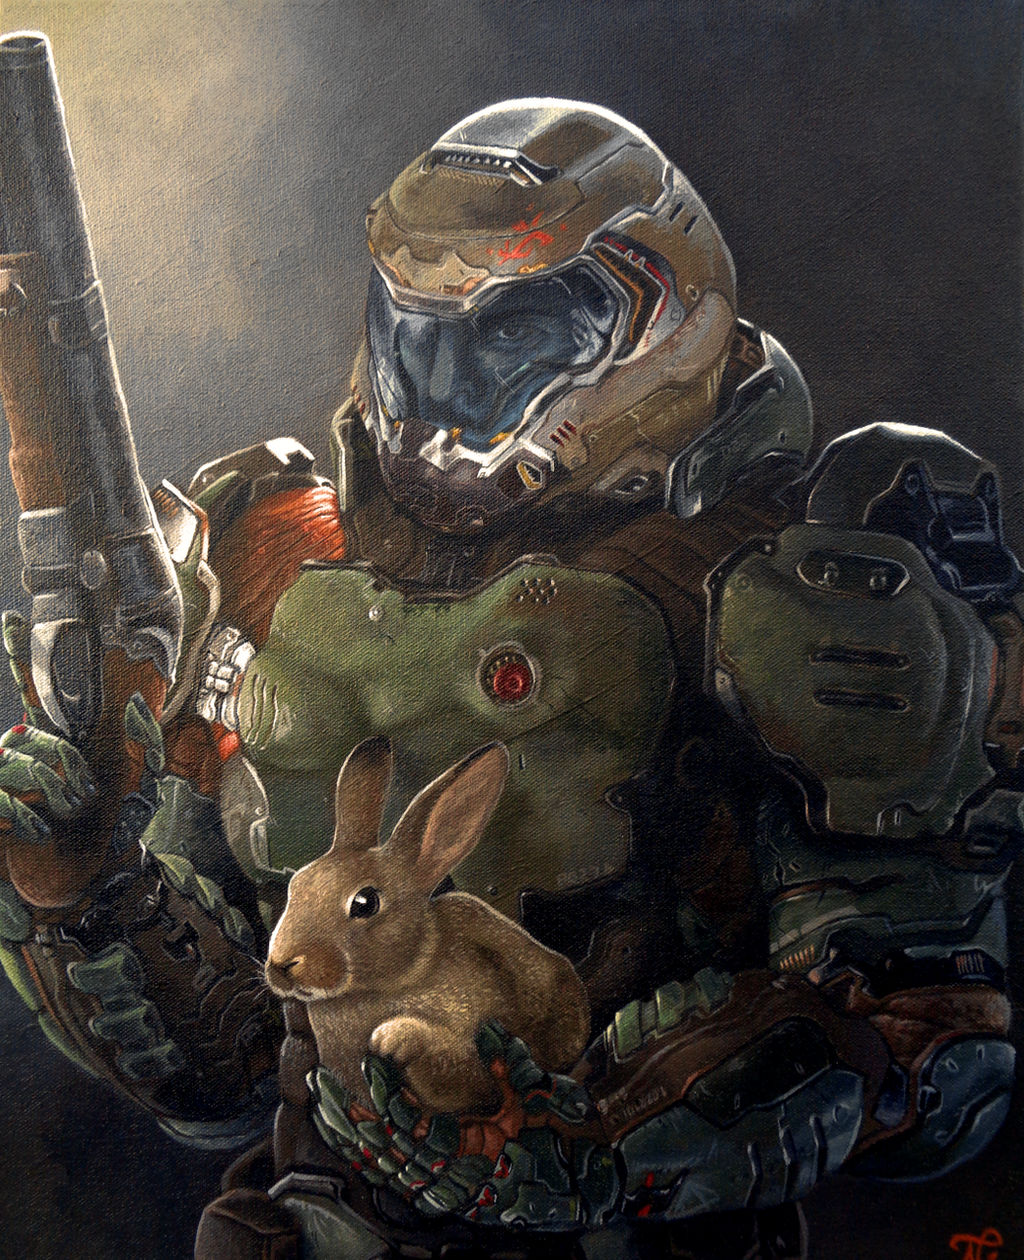 Doom Slayer And Daisy By Xous54 On Deviantart